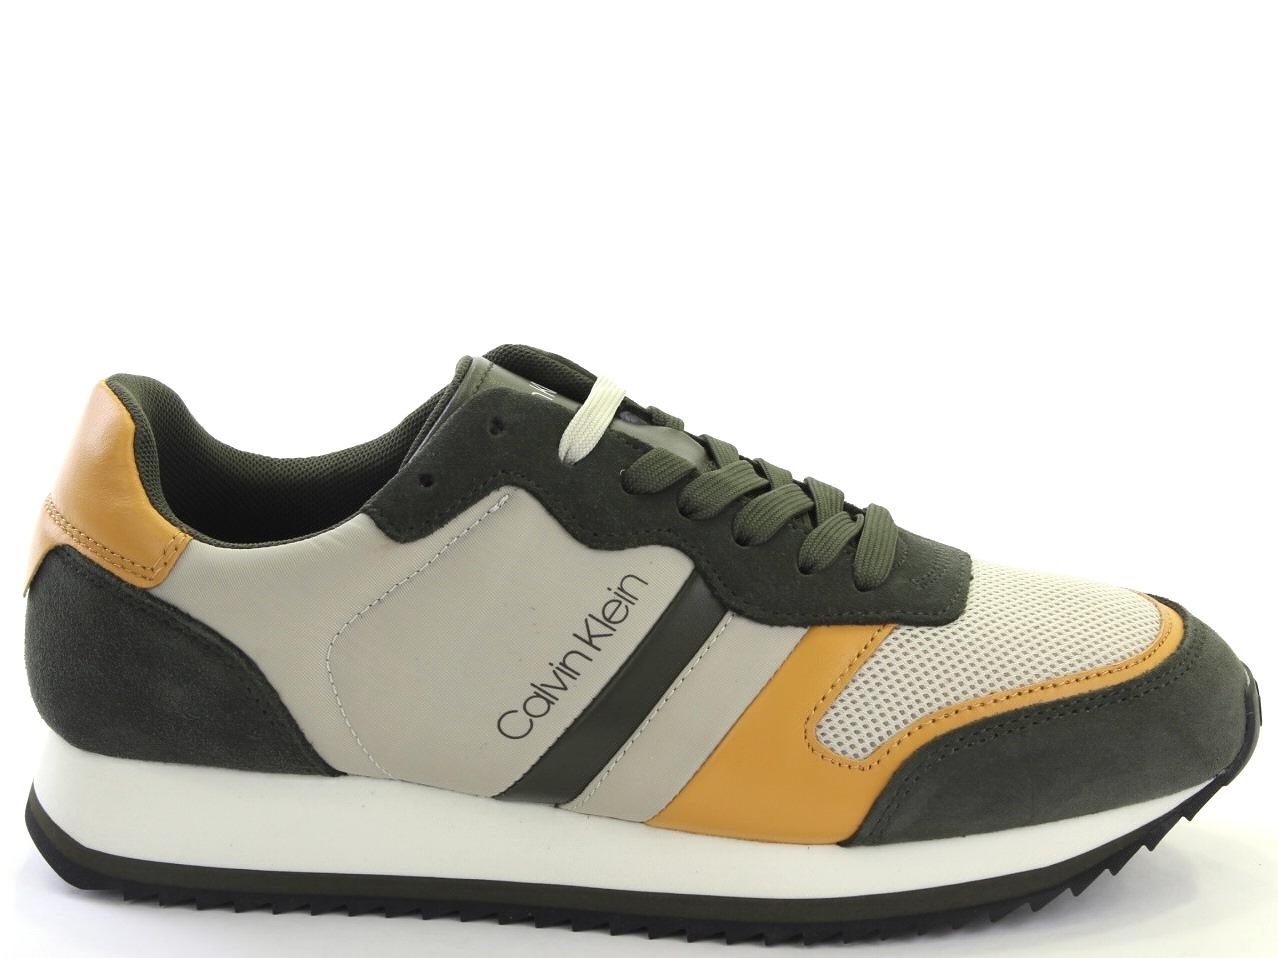 Sneakers, Espadrilles Calvin Klein - 499 HM003150